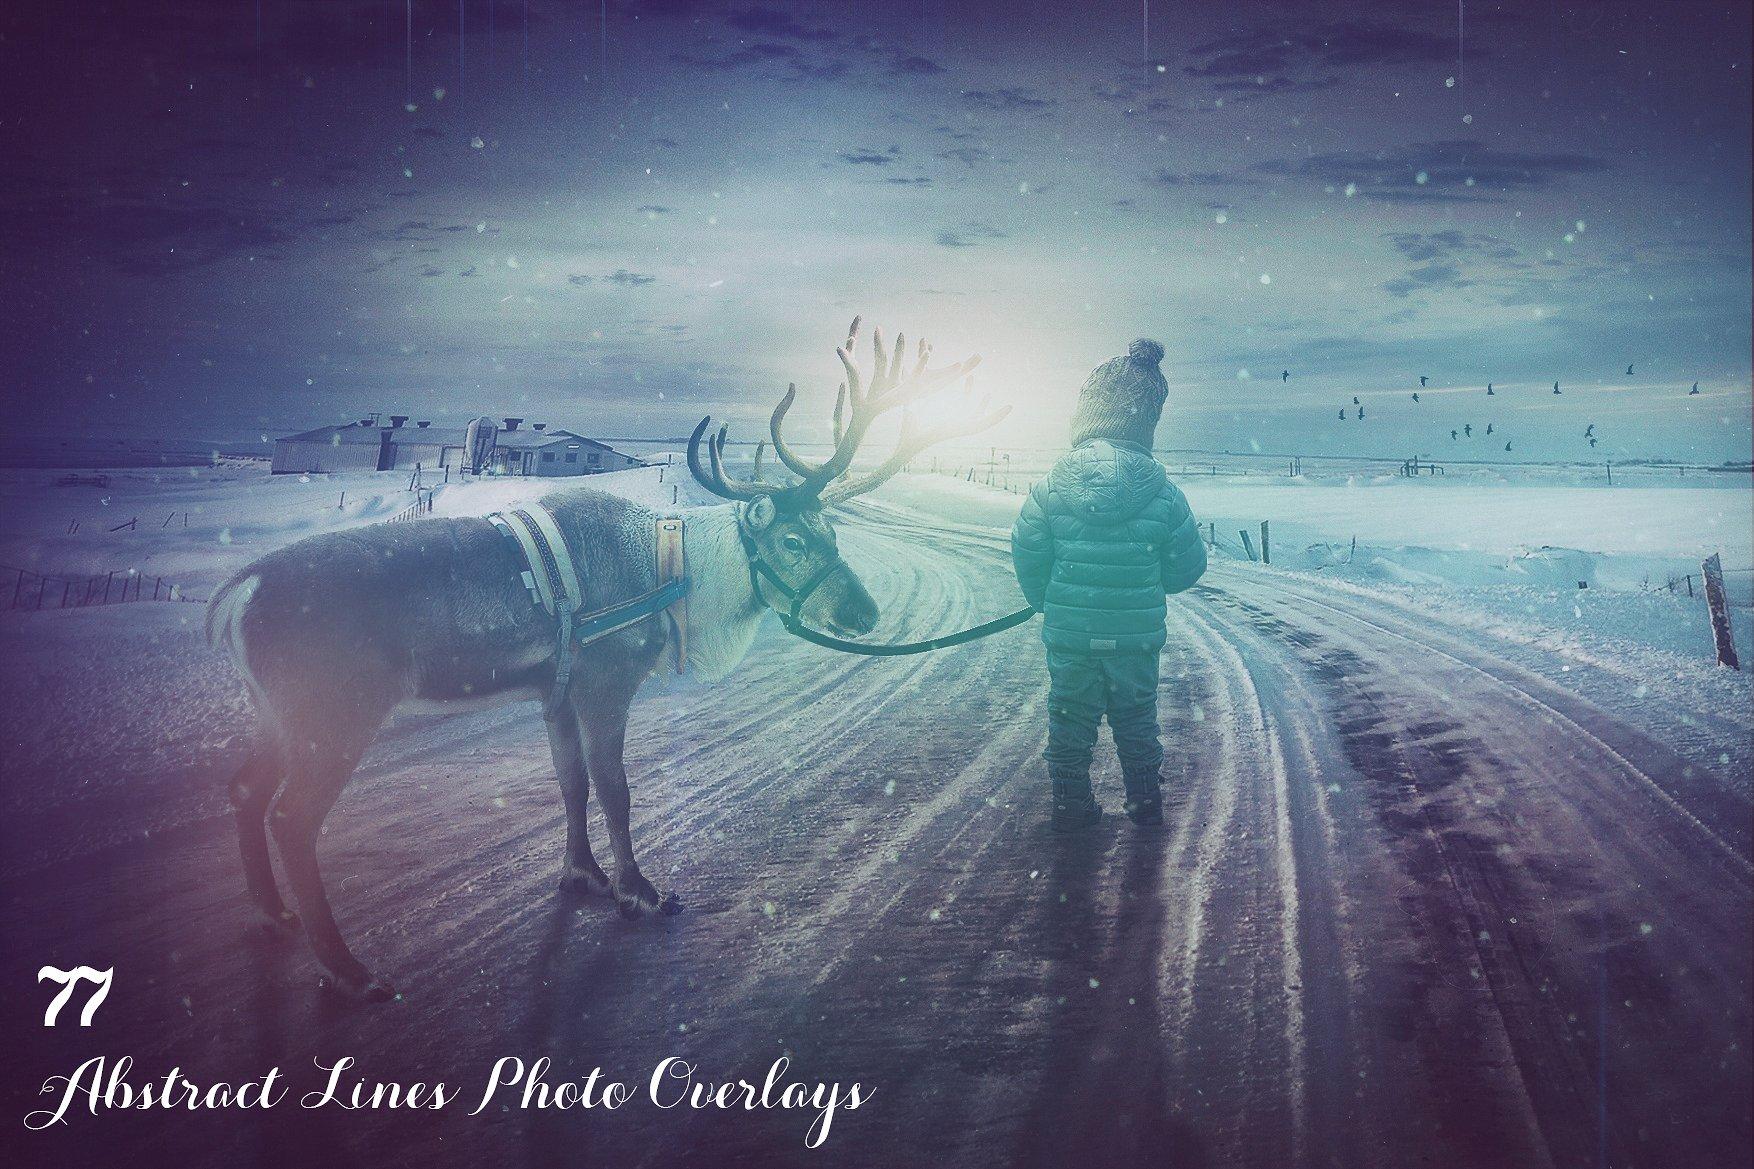 2500+ Christmas & Winter Overlays Bundle - $29 - 25 min